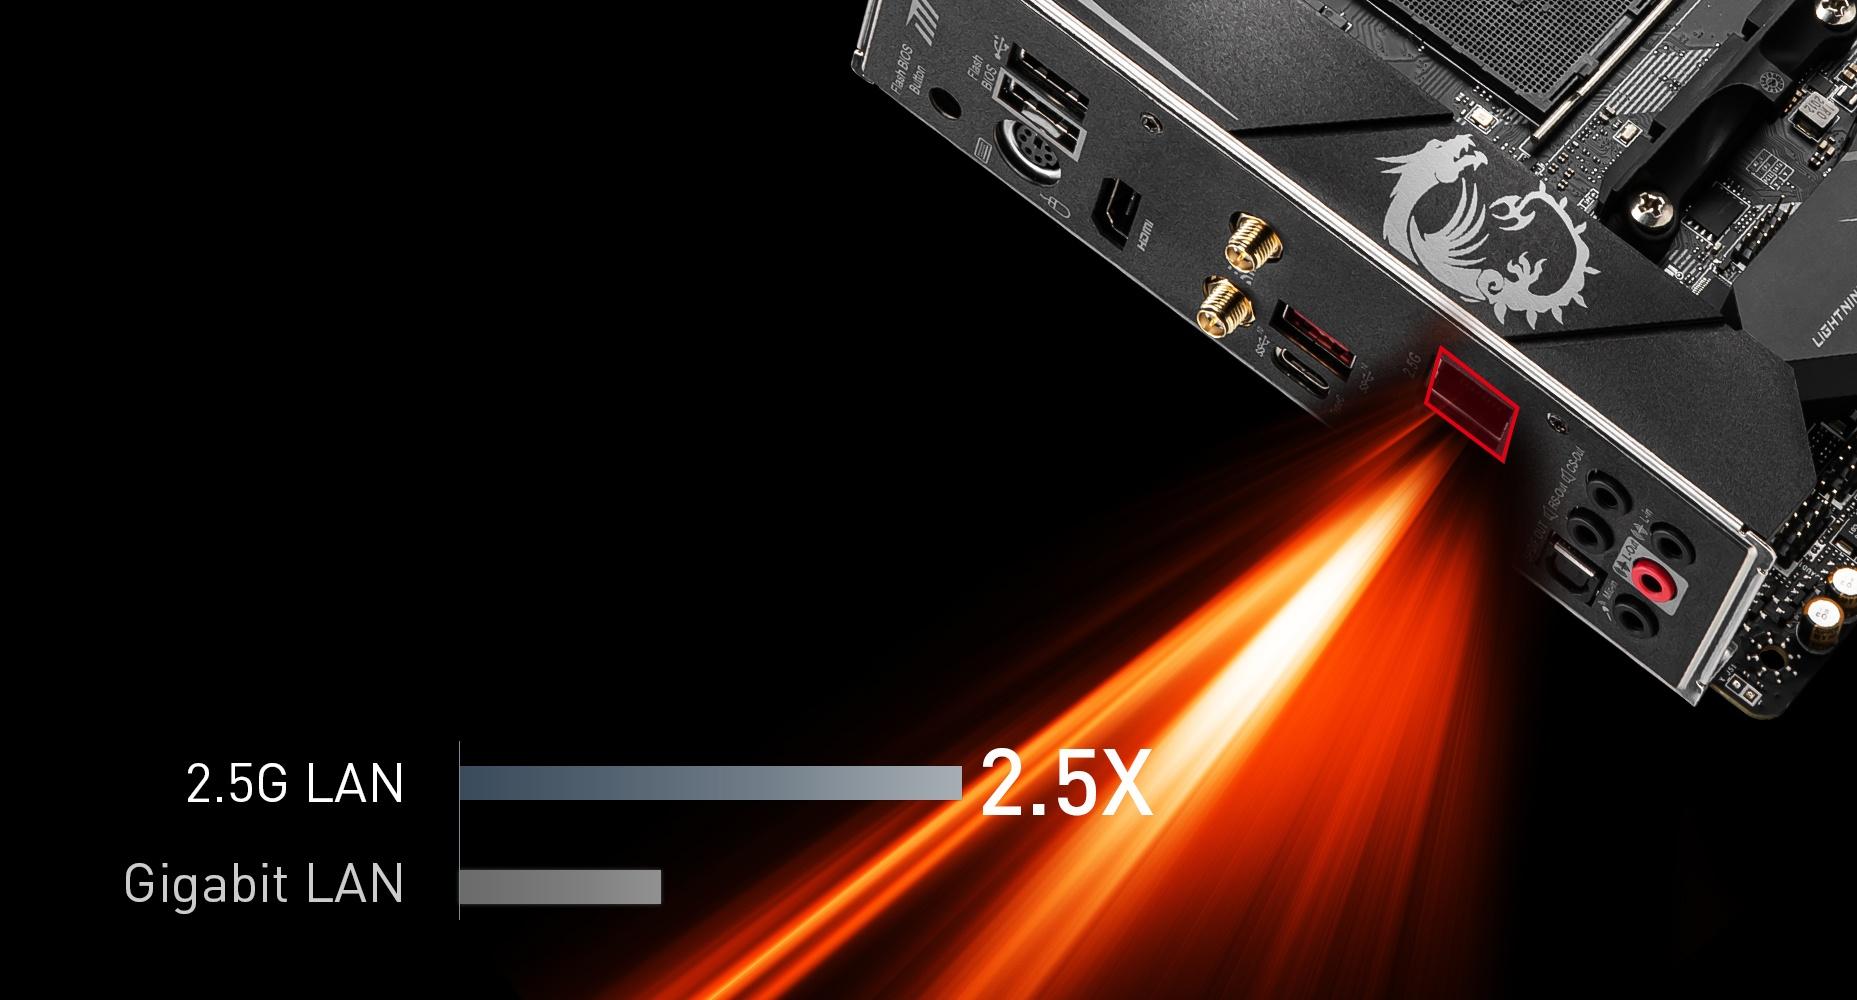 MSI MPG B550I GAMING EDGE WIFI MAXIMIUM DATA TRANSFER WITH 2.5G LAN